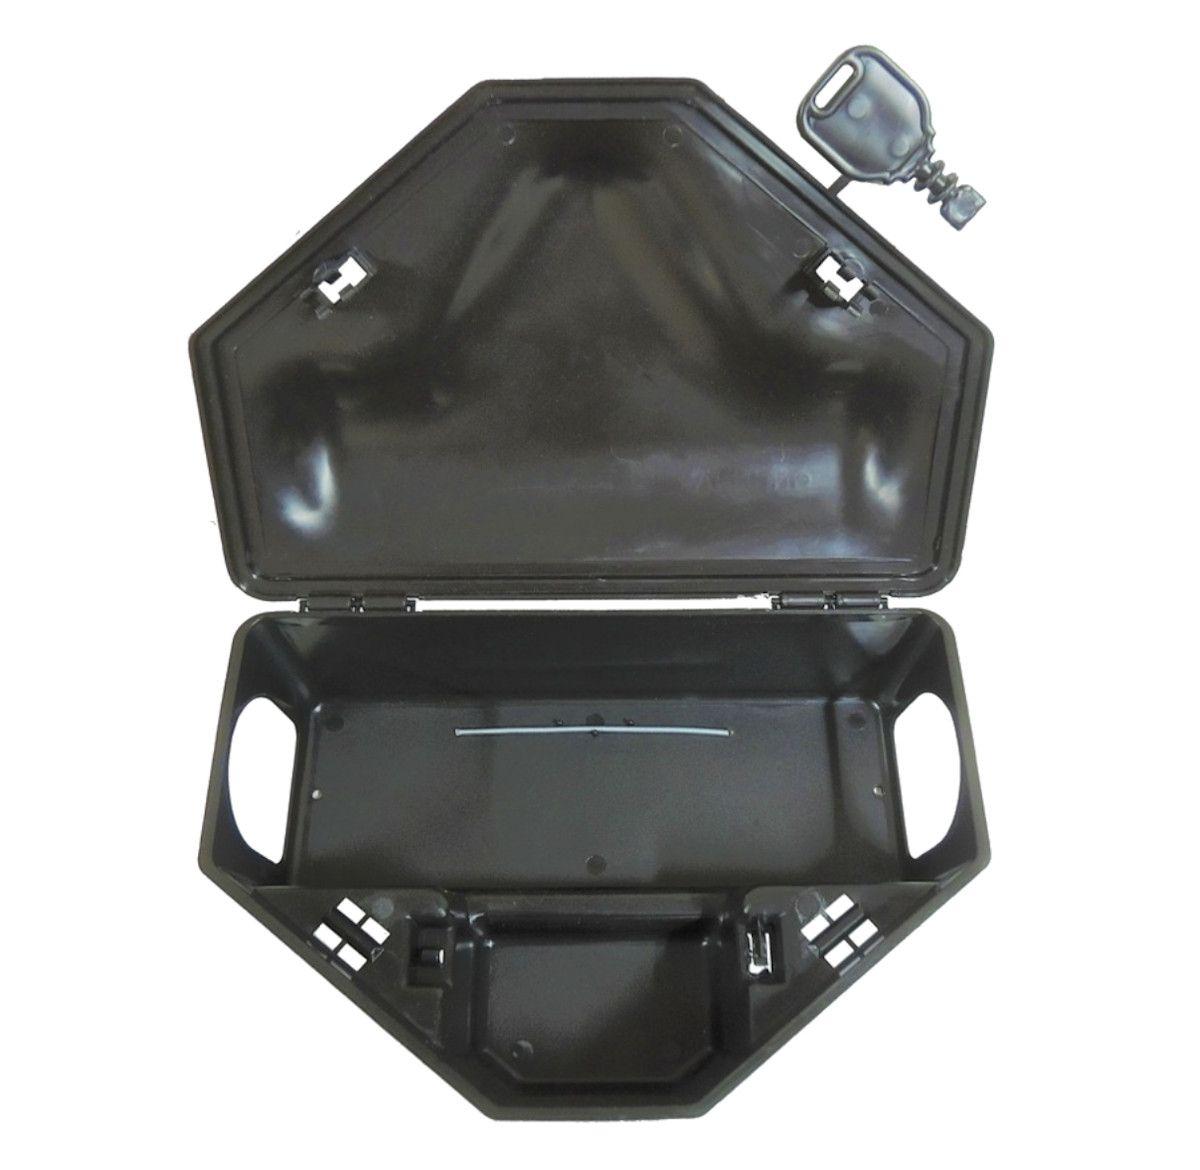 Kit 45 Porta Isca Com Chave Para Ratos